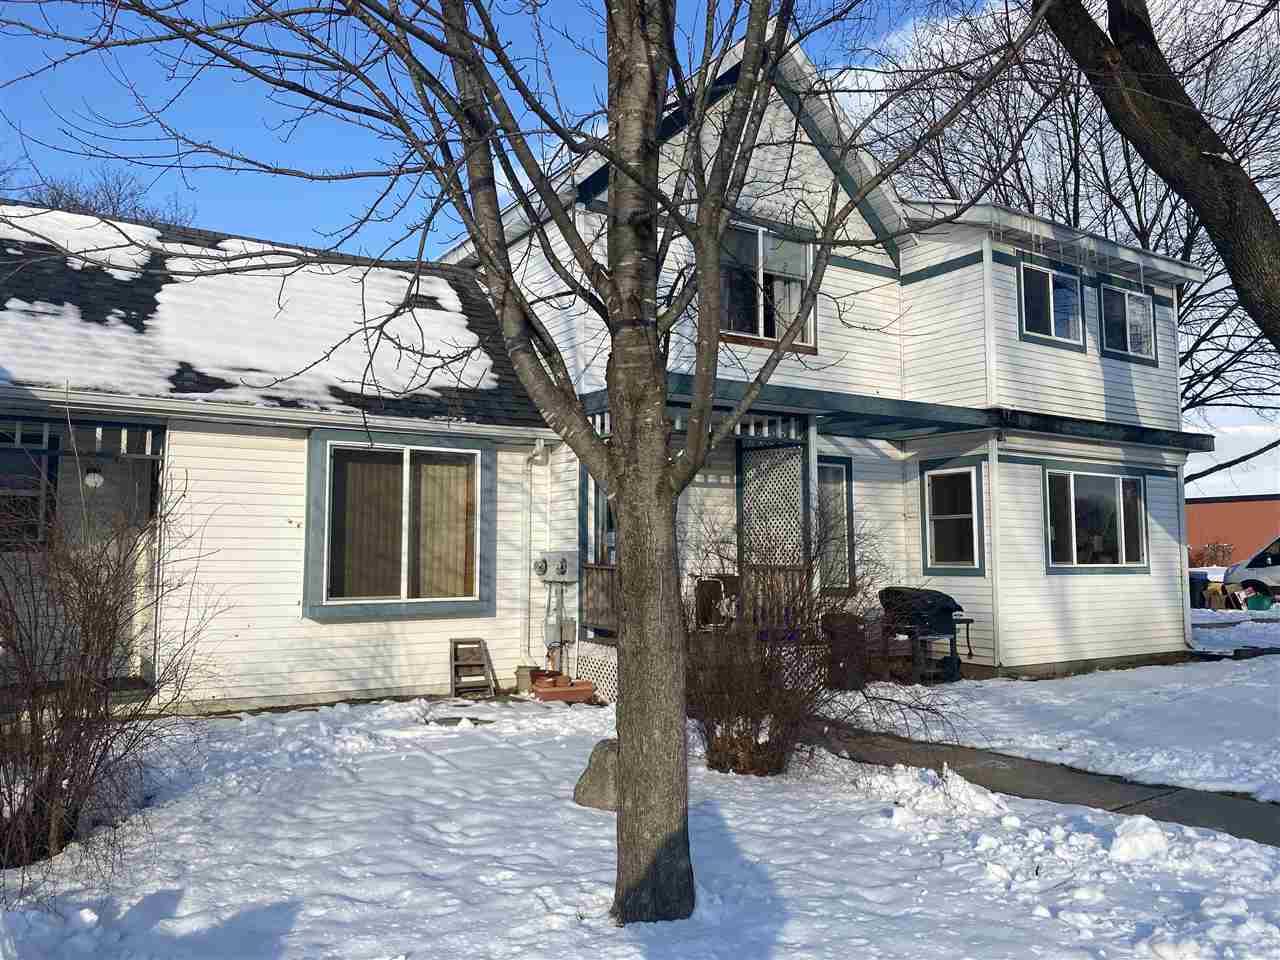 1208 Spring St, Black Earth, Wisconsin 53515, 2 Bedrooms Bedrooms, ,Rental,For Rent,Spring St,1900426